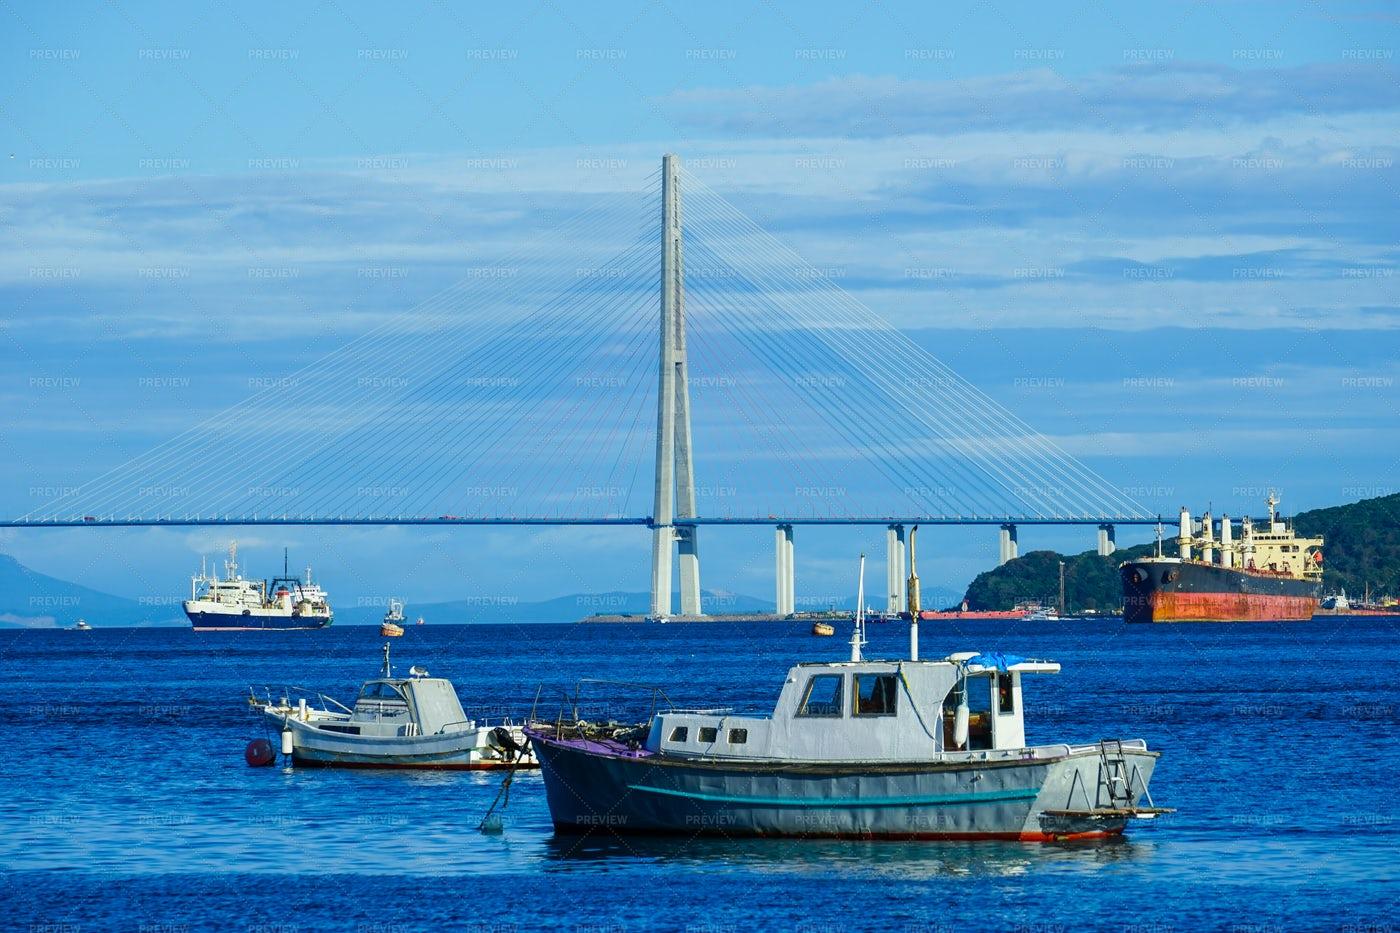 Vladivostok Seascape With Boats: Stock Photos